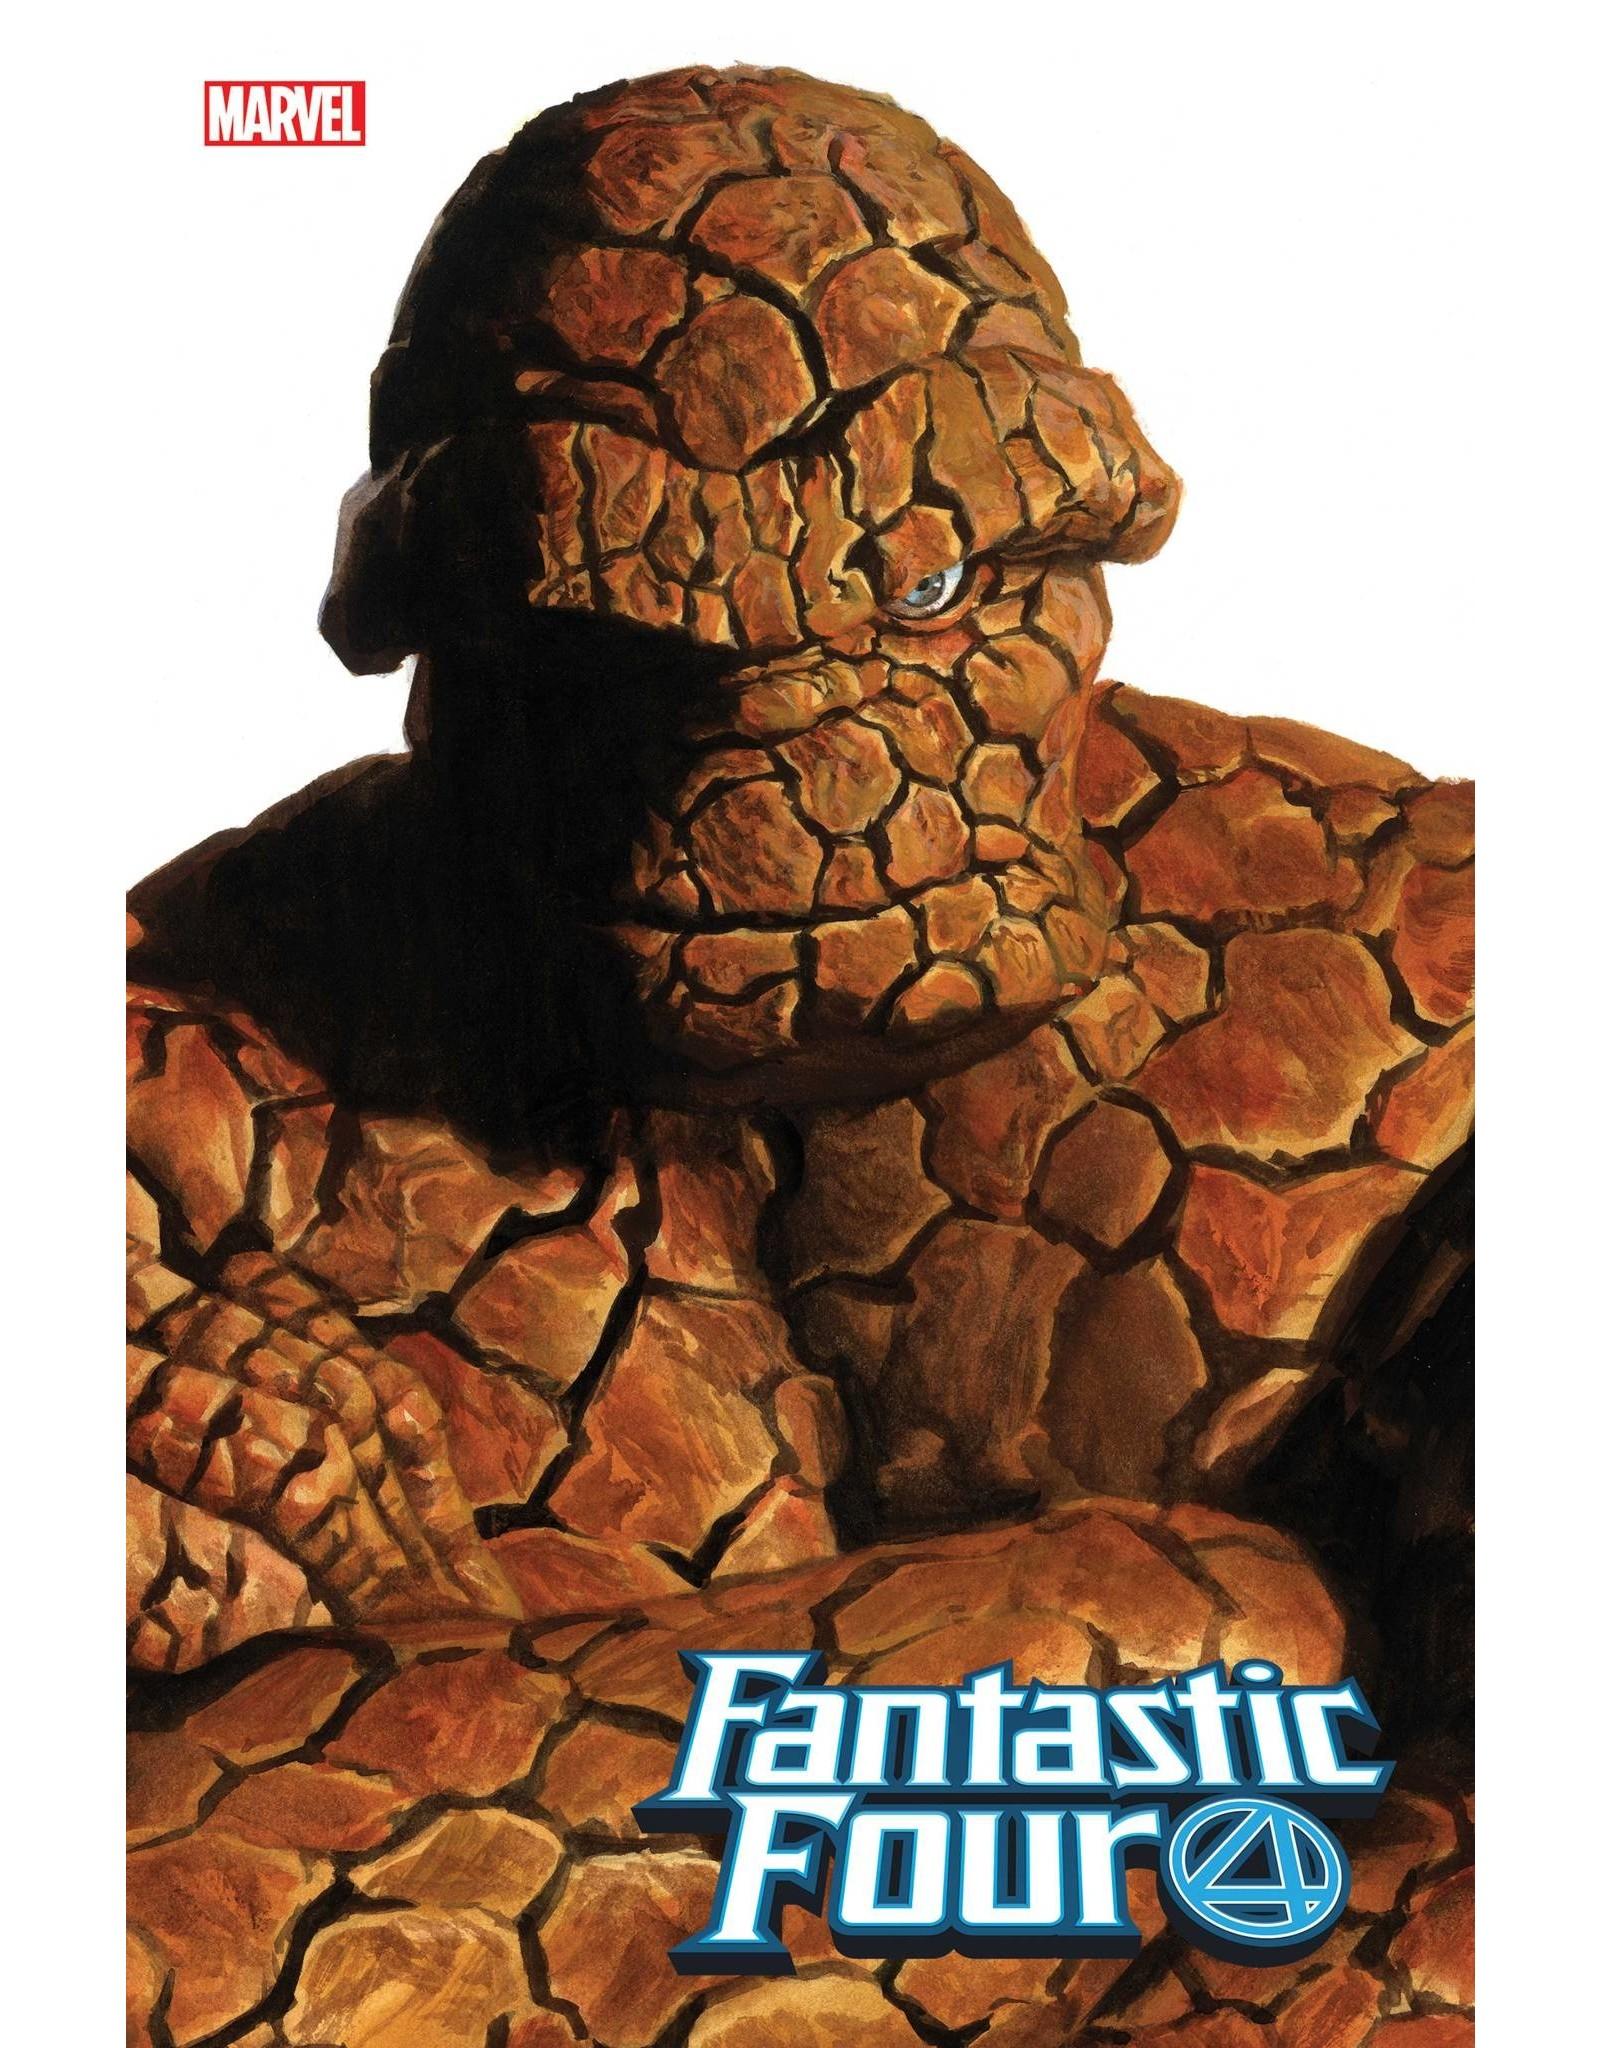 Marvel Comics FANTASTIC FOUR #24 ALEX ROSS THING TIMELESS VAR